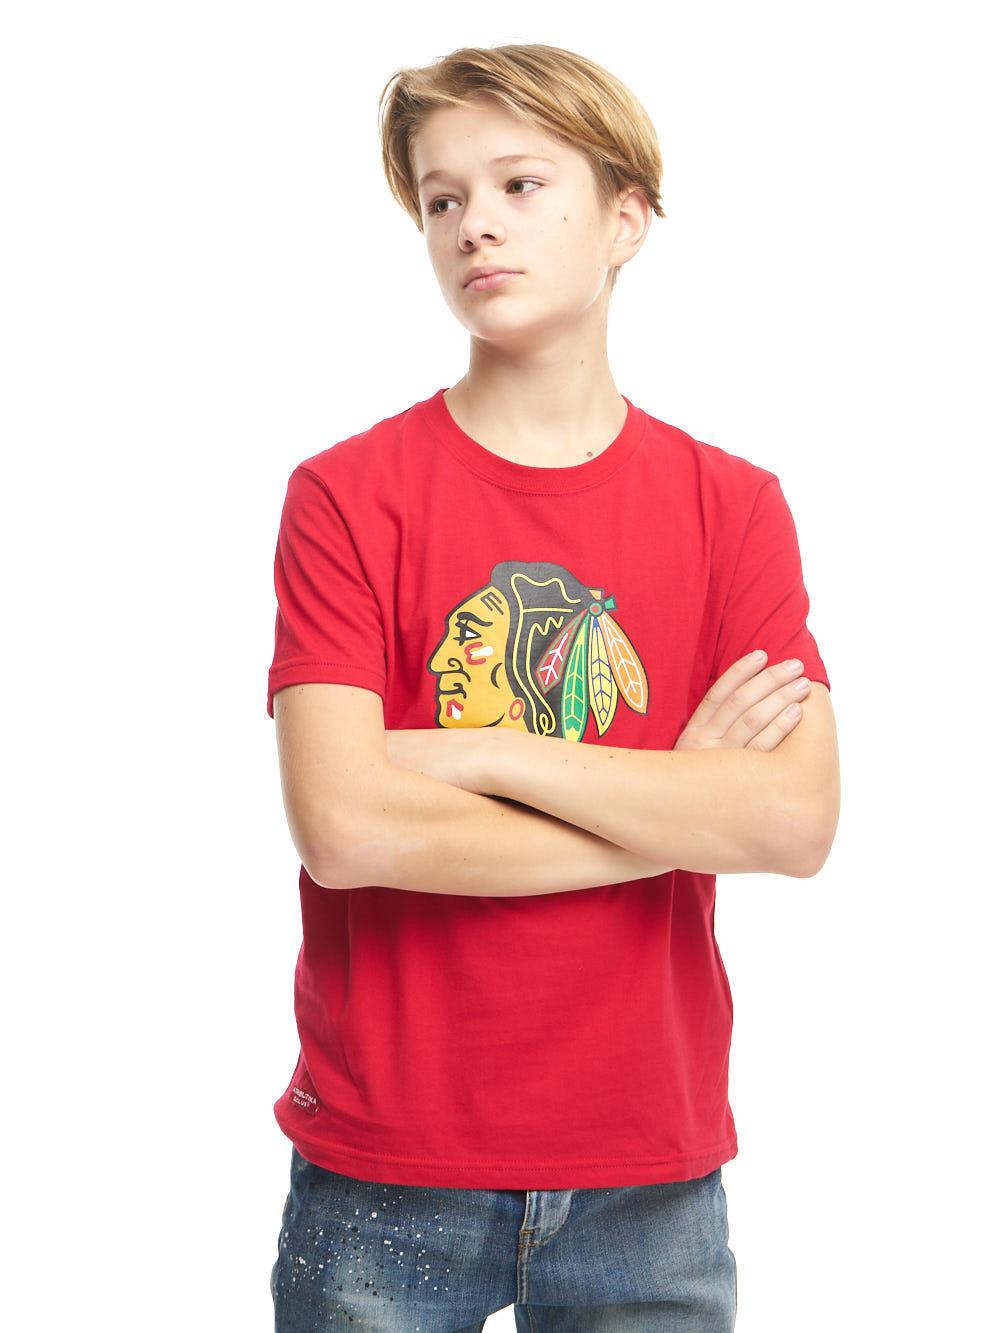 Футболка NHL Chicago Blackhawks (подростковая)